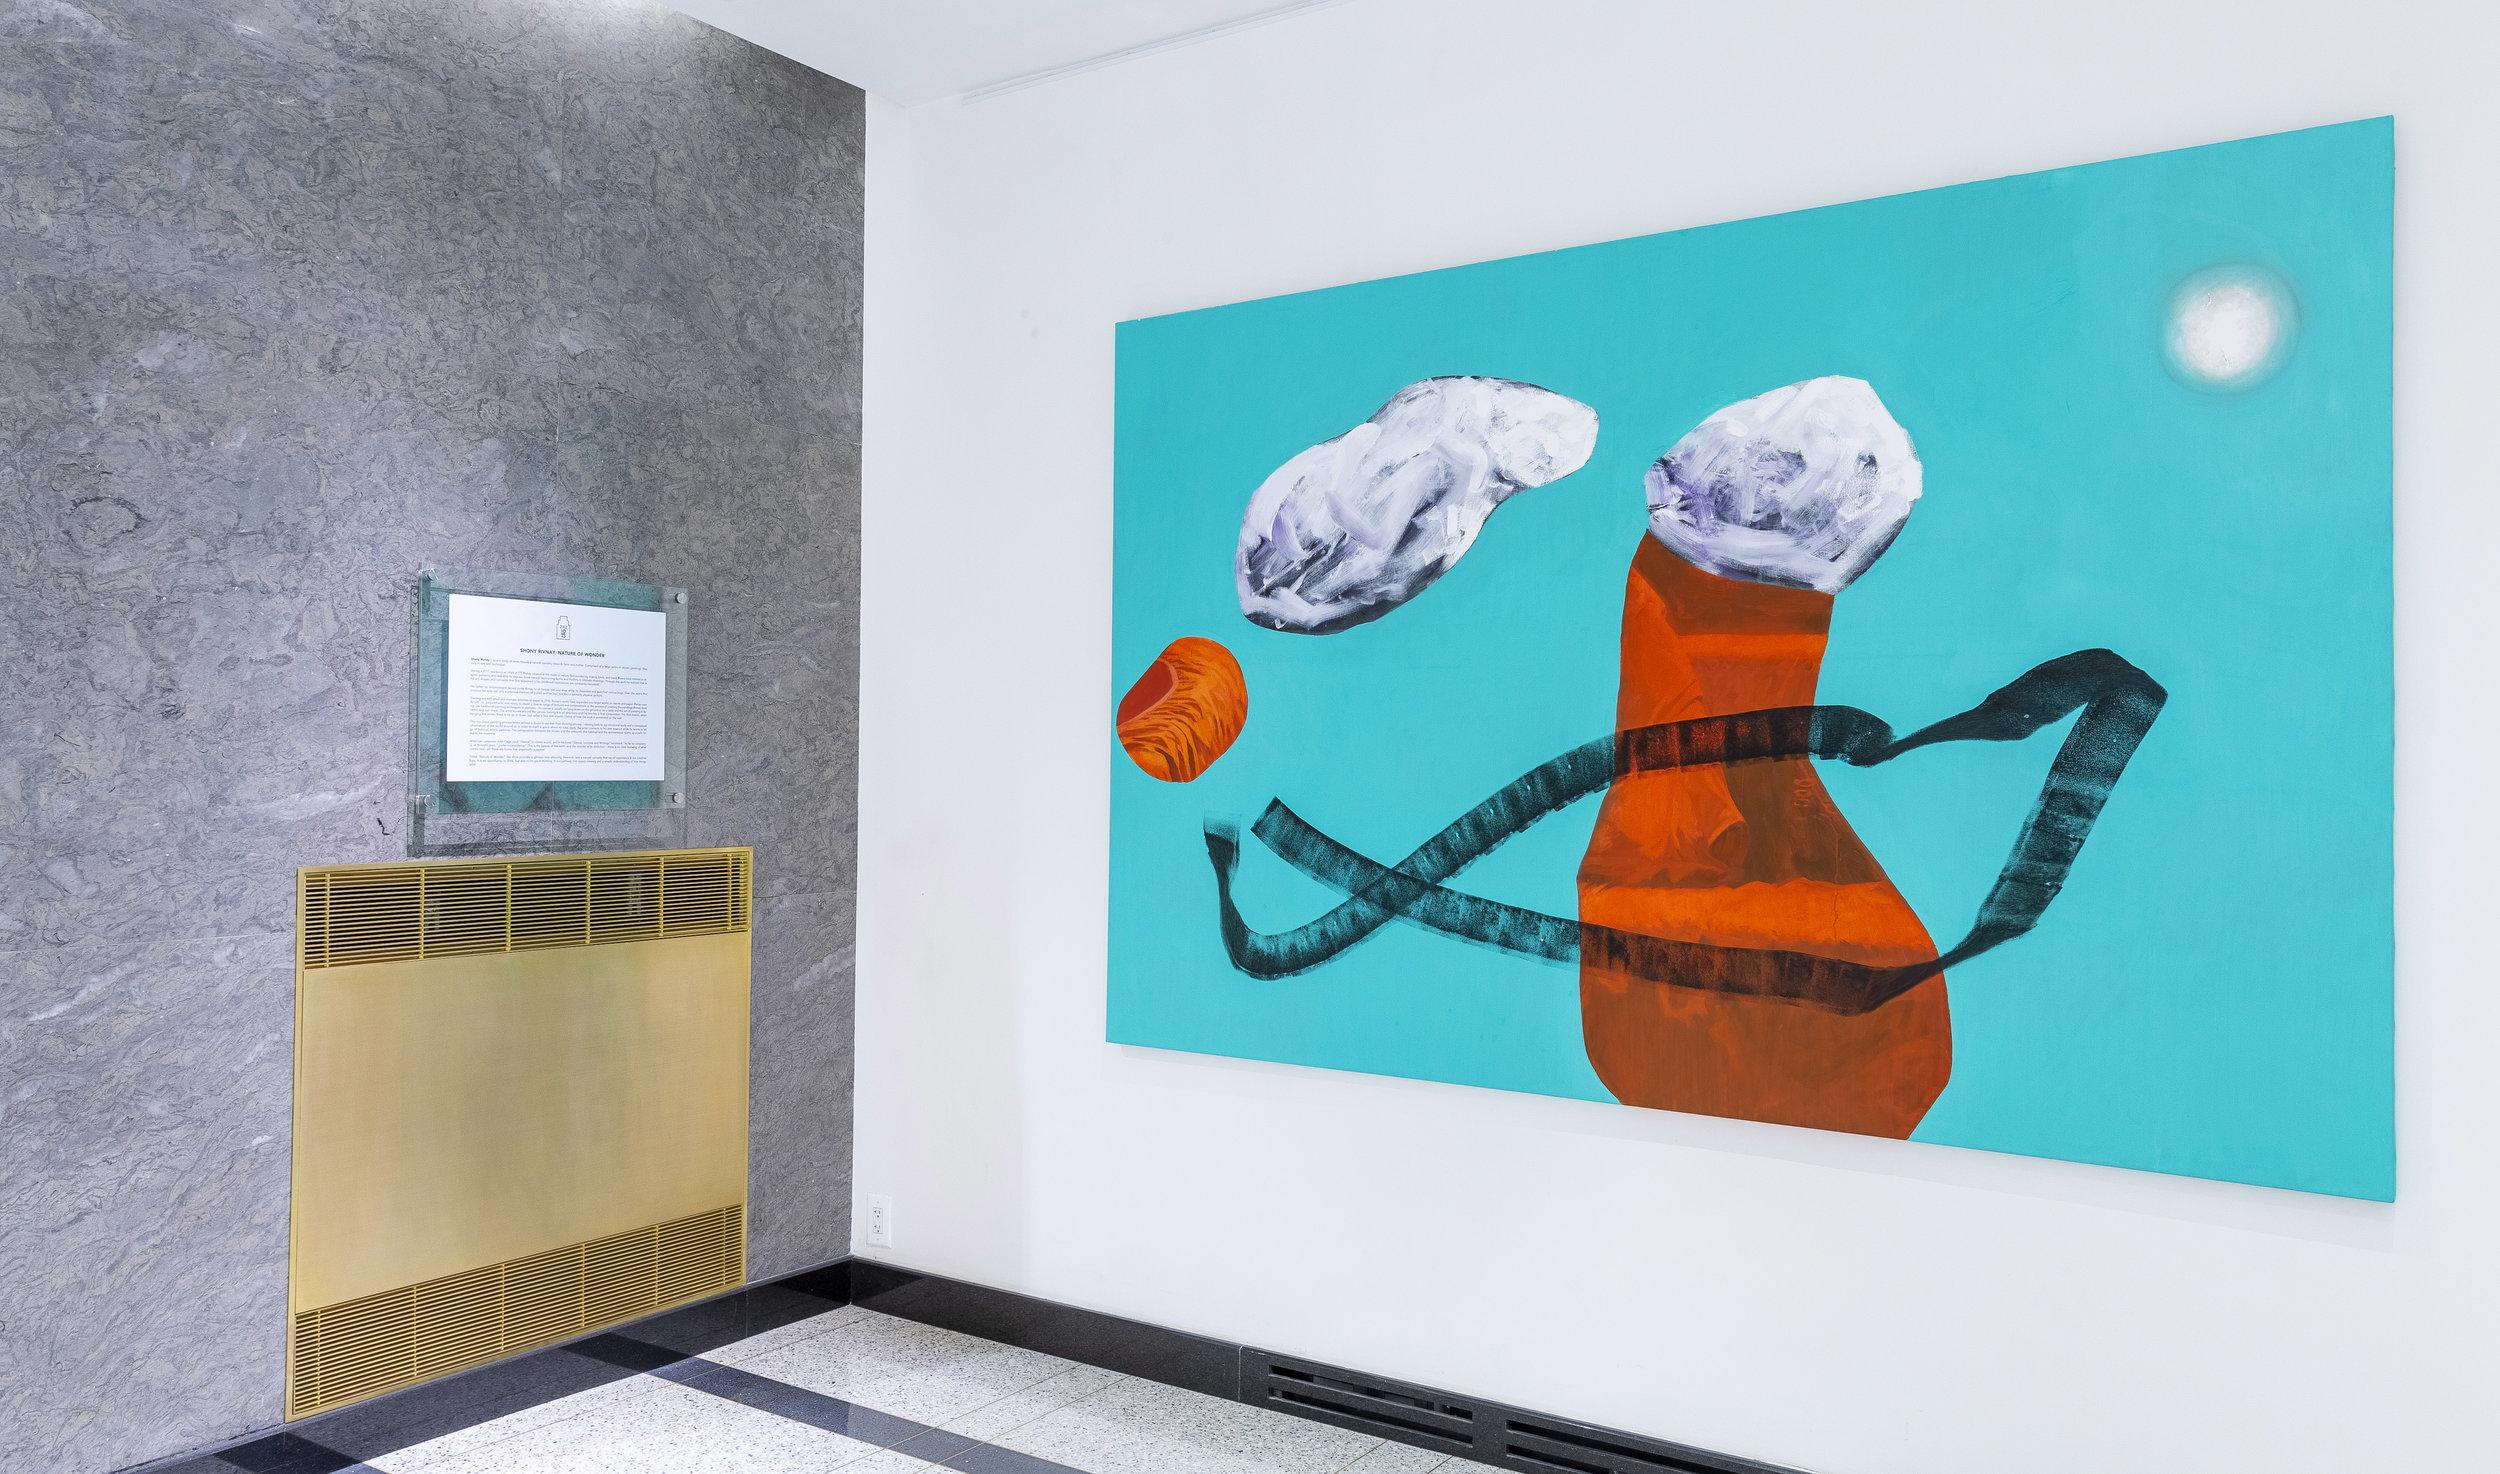 Exhibition photos by Zdravko Cota, courtesy of ZAZ10TS